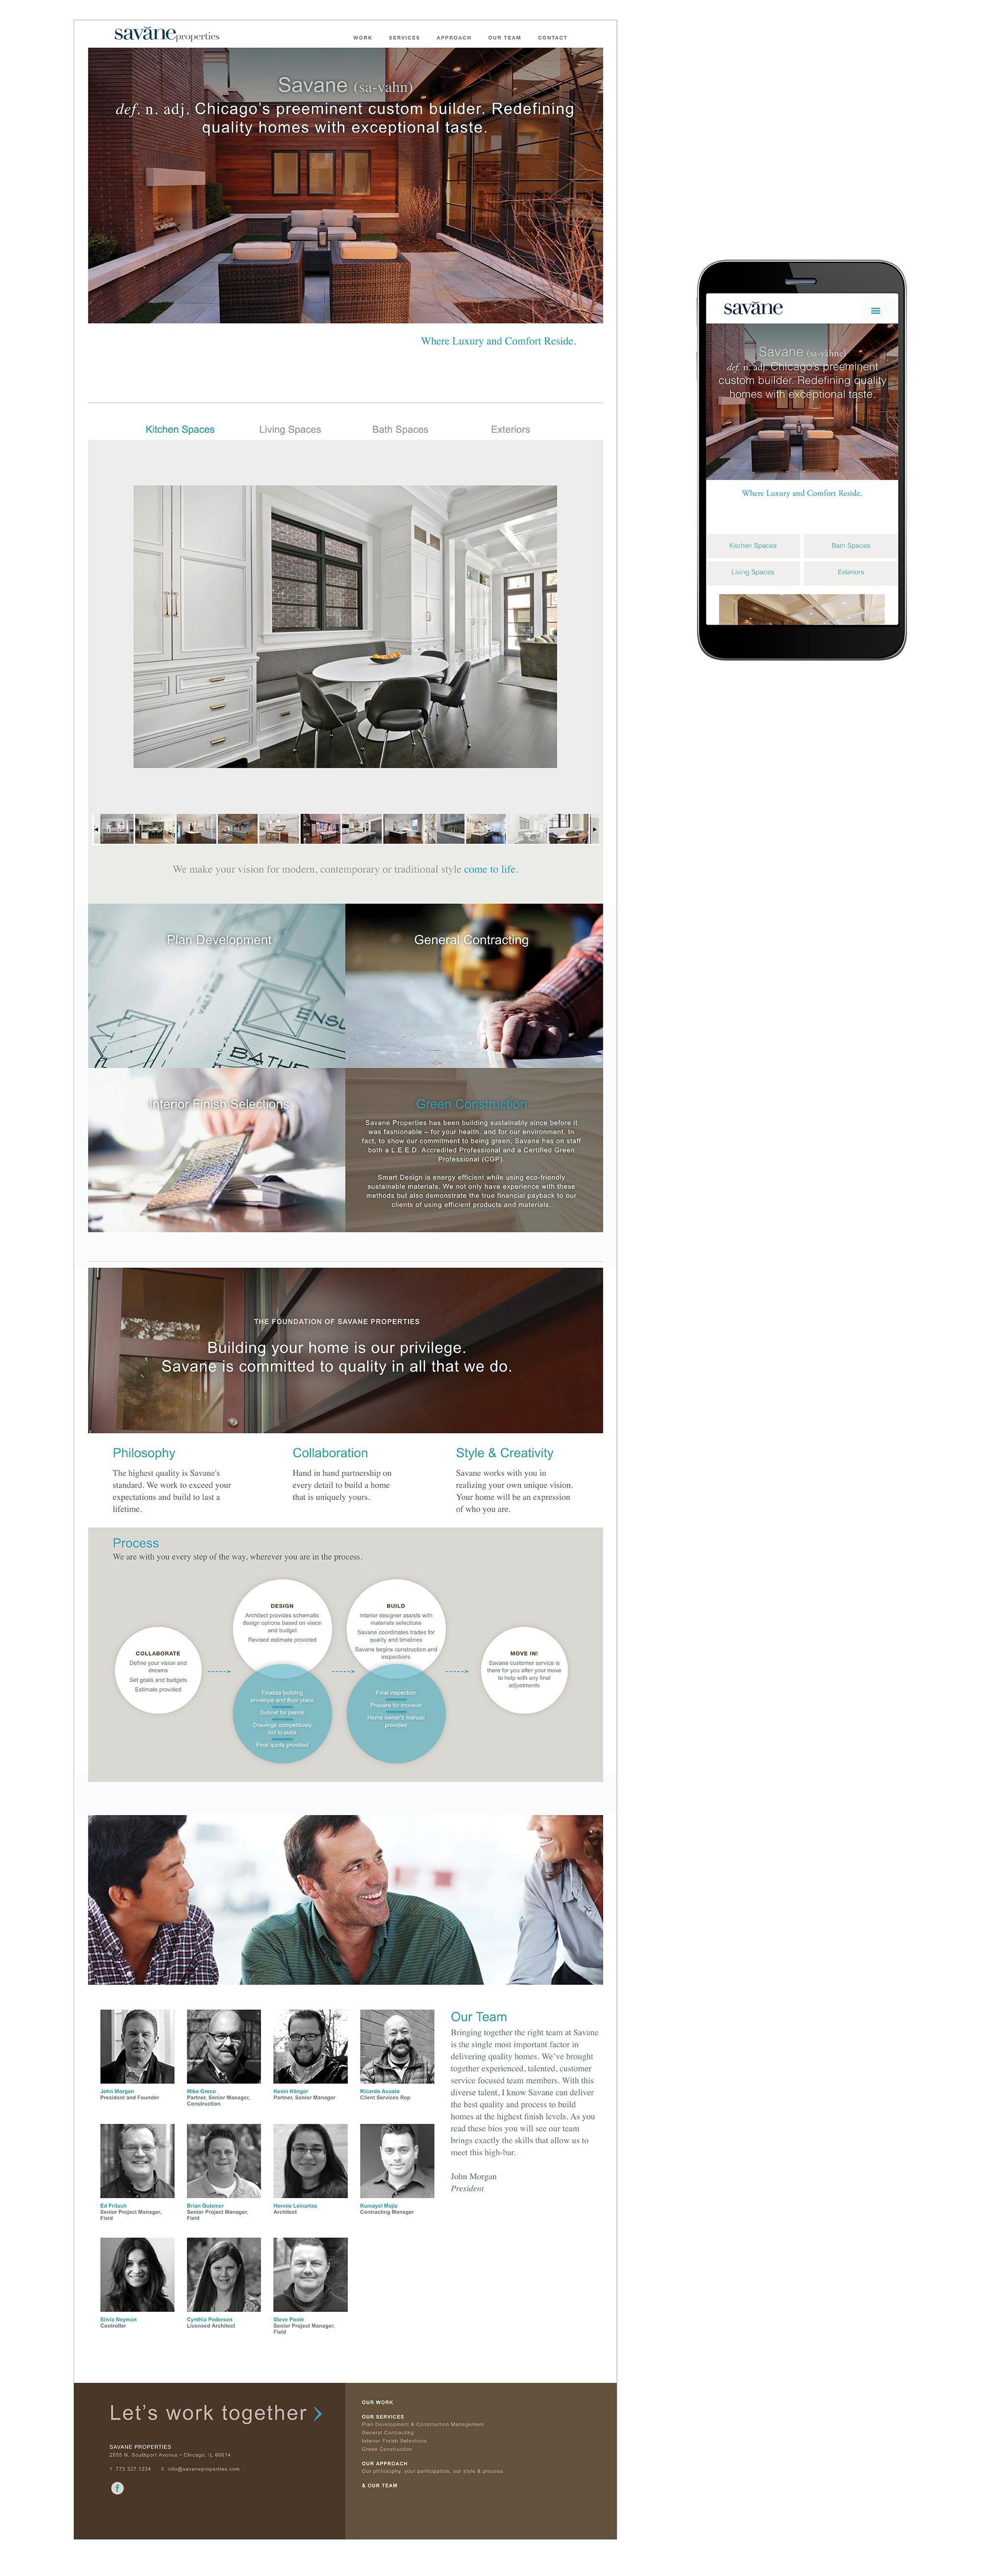 Forward Design Website Design_2019_Savane_12 b.jpg